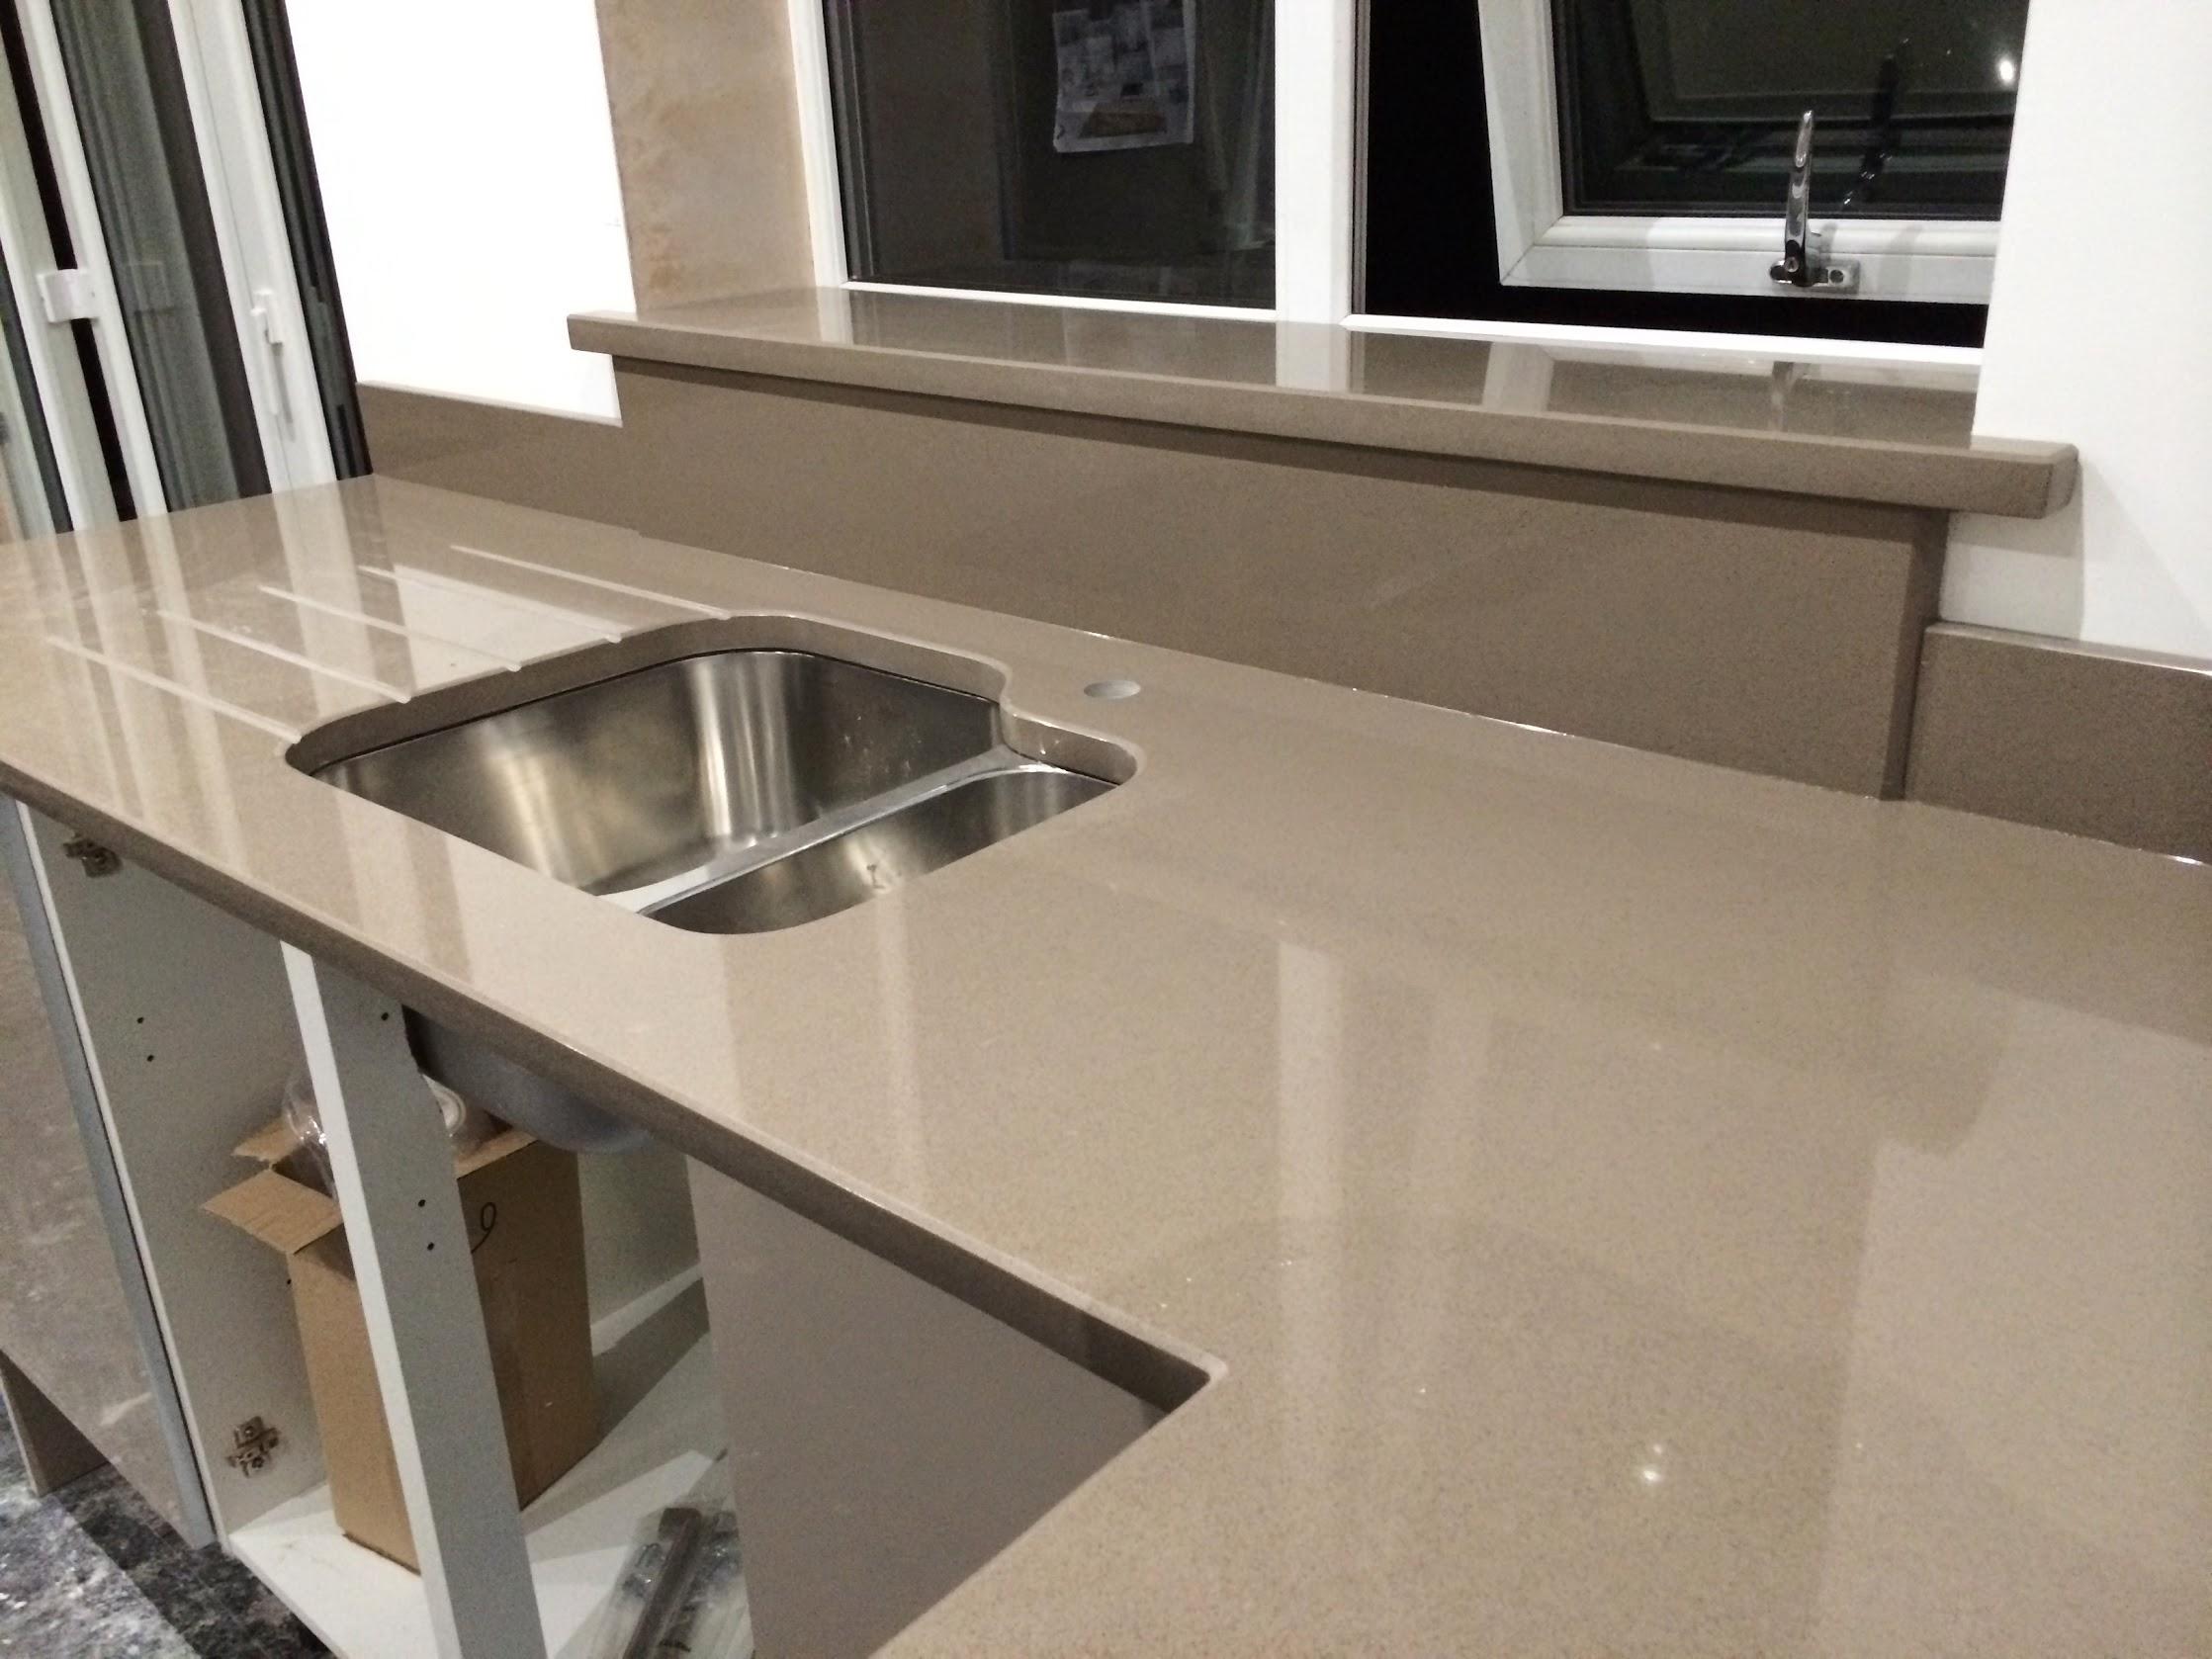 Cuba Tile Kitchen Backsplash